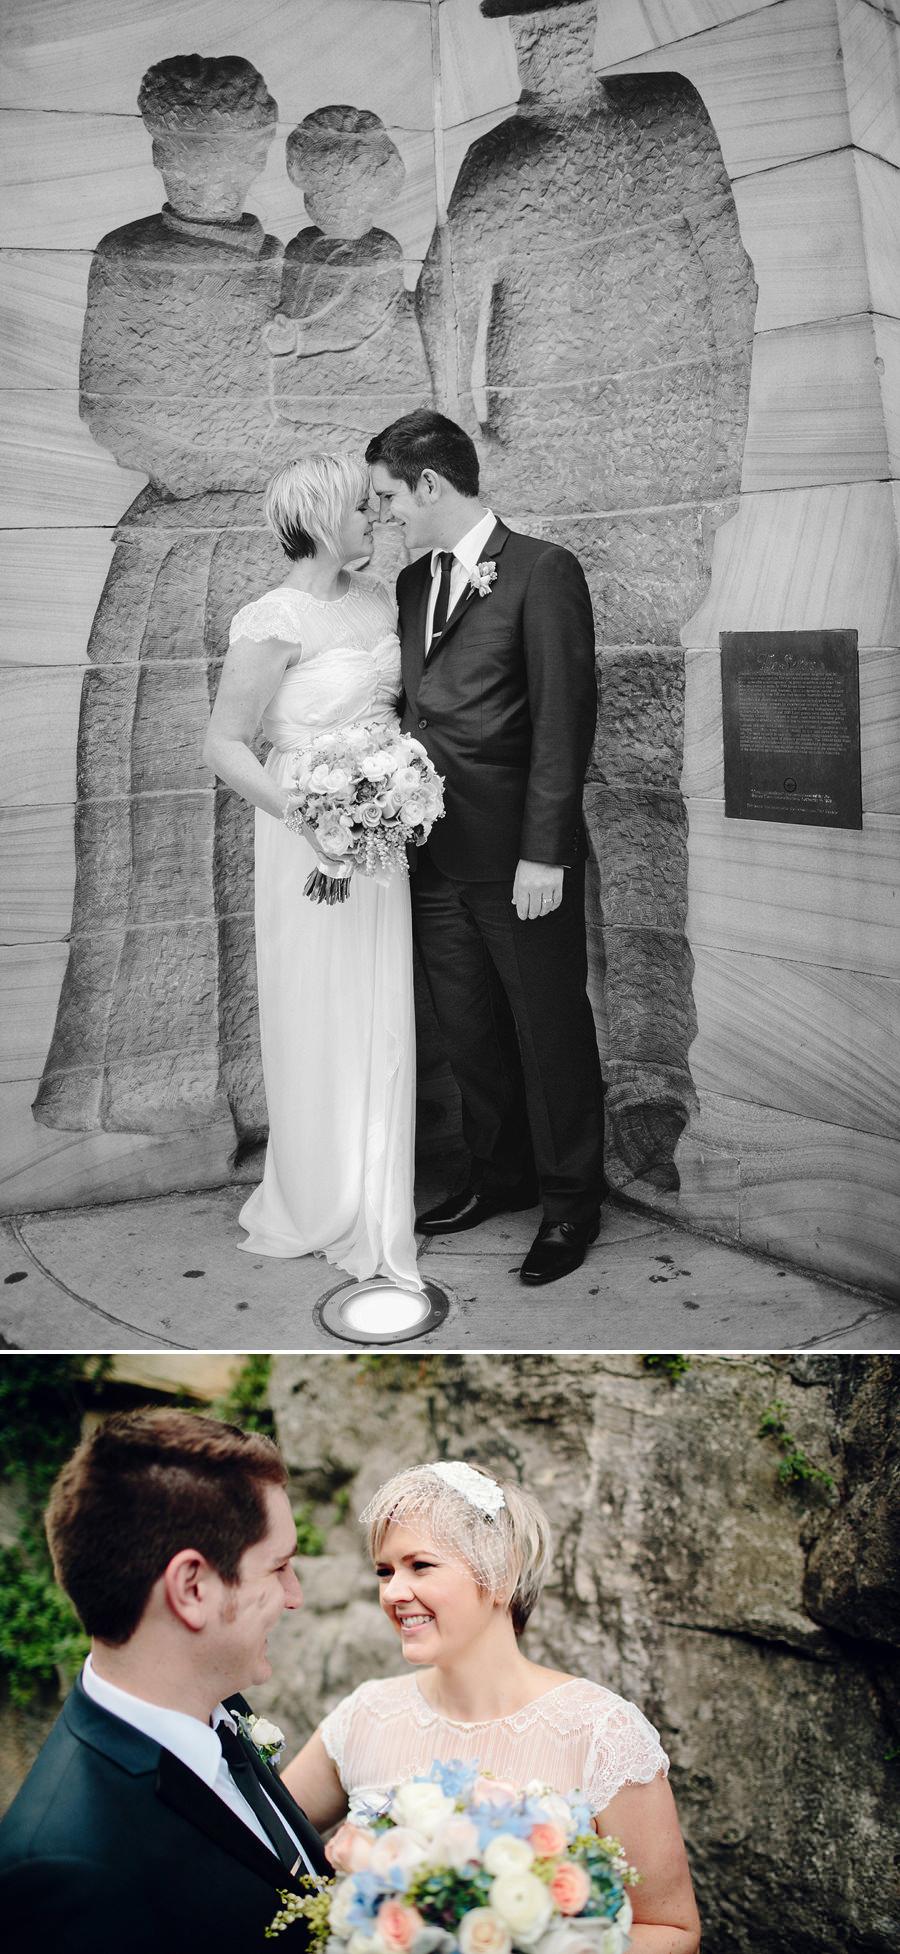 The Rocks Wedding Photography: Bride & Groom portraits